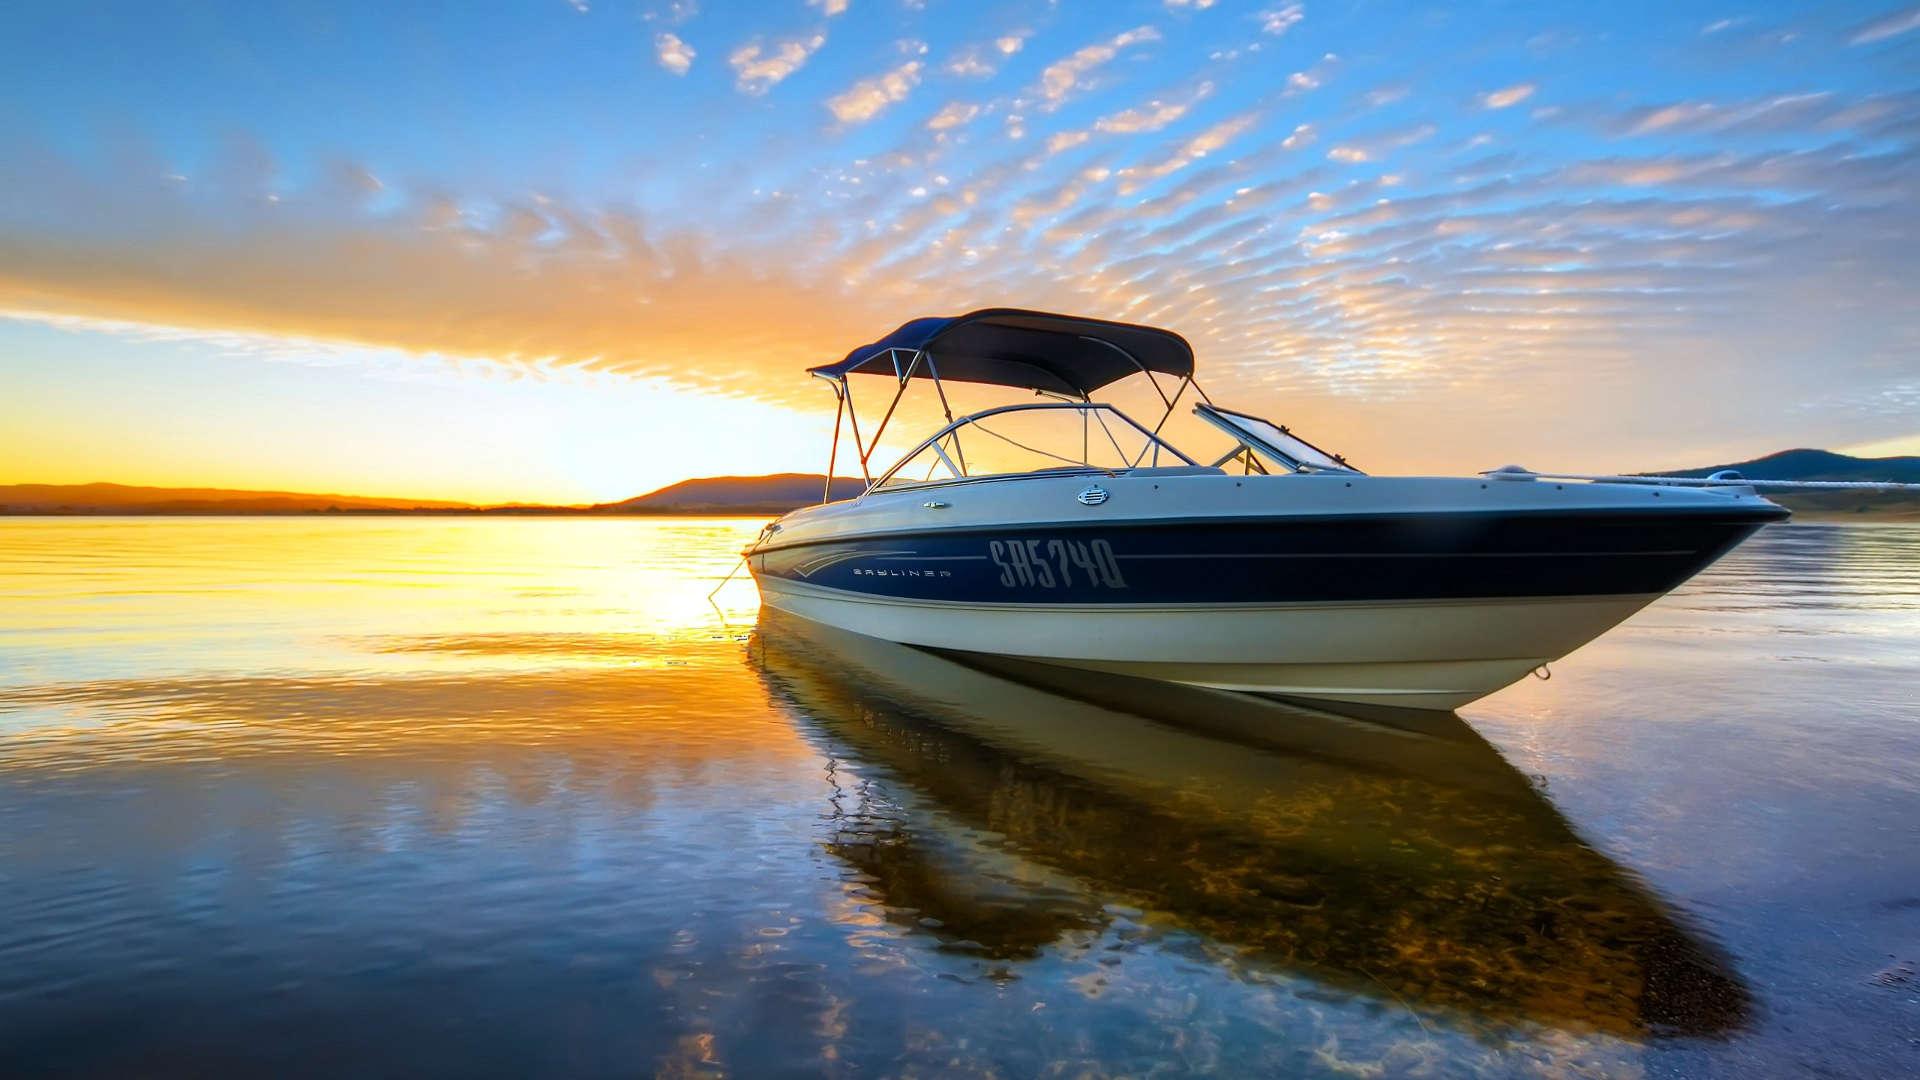 http://louladakis-apts.gr/wp-content/uploads/2016/05/louladakis_activities_boat_trip.jpg